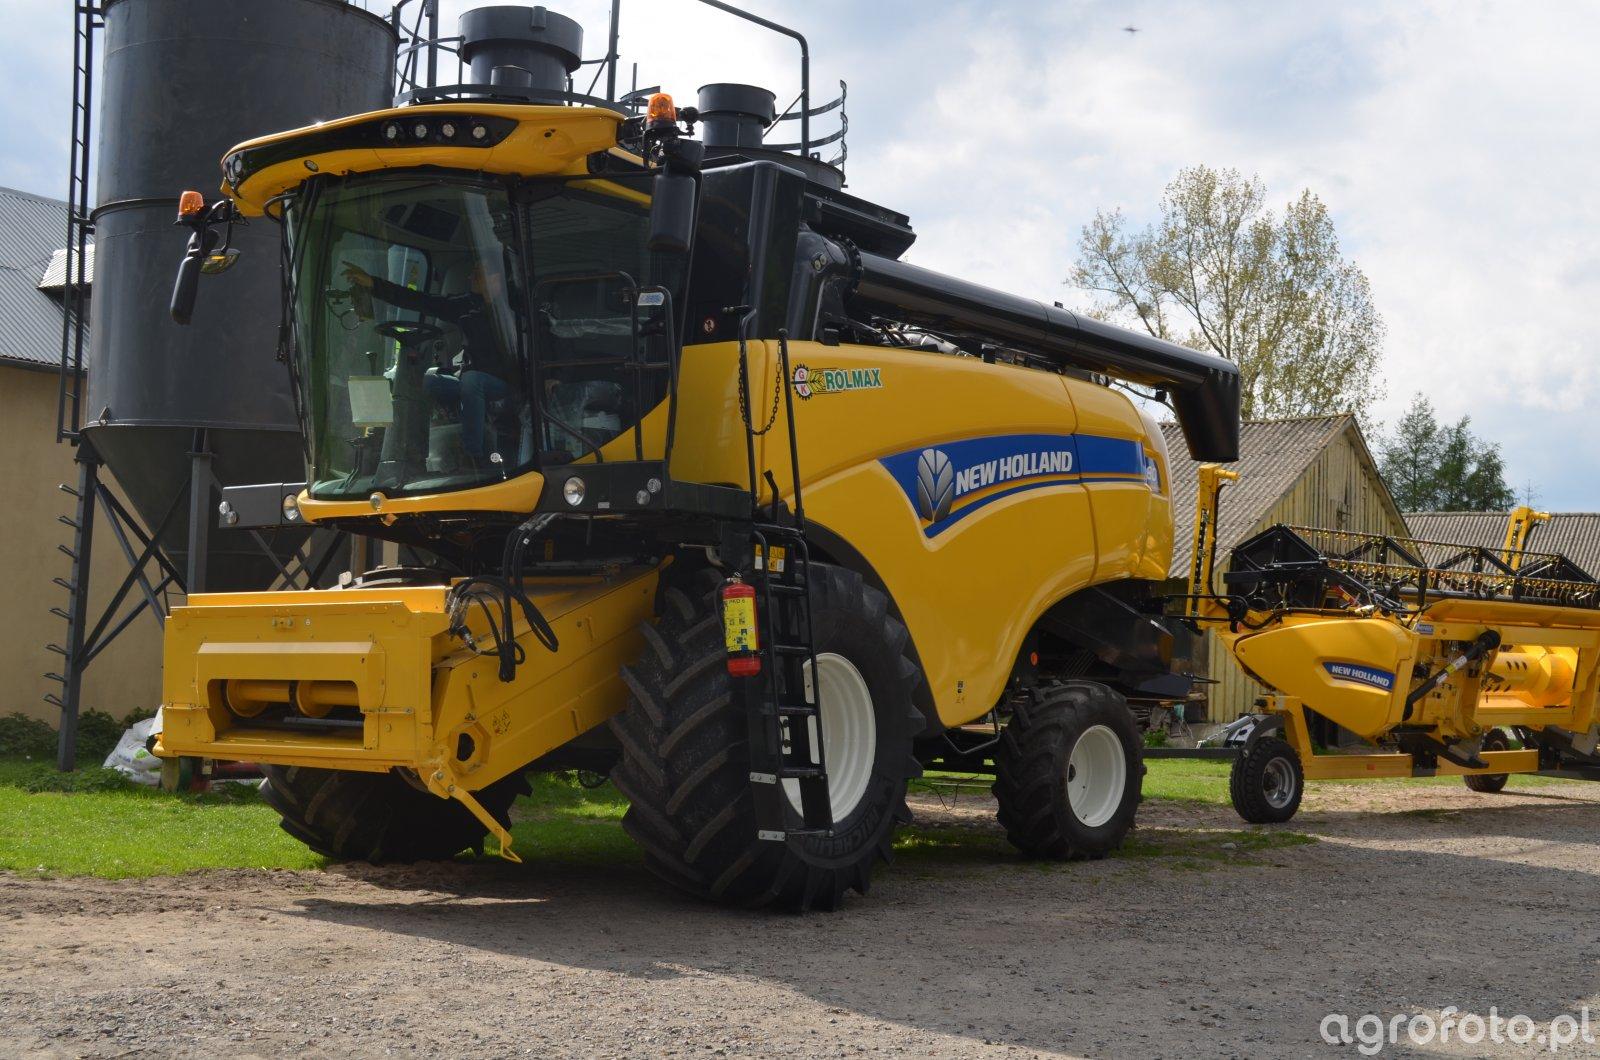 New Holland CX 5.80